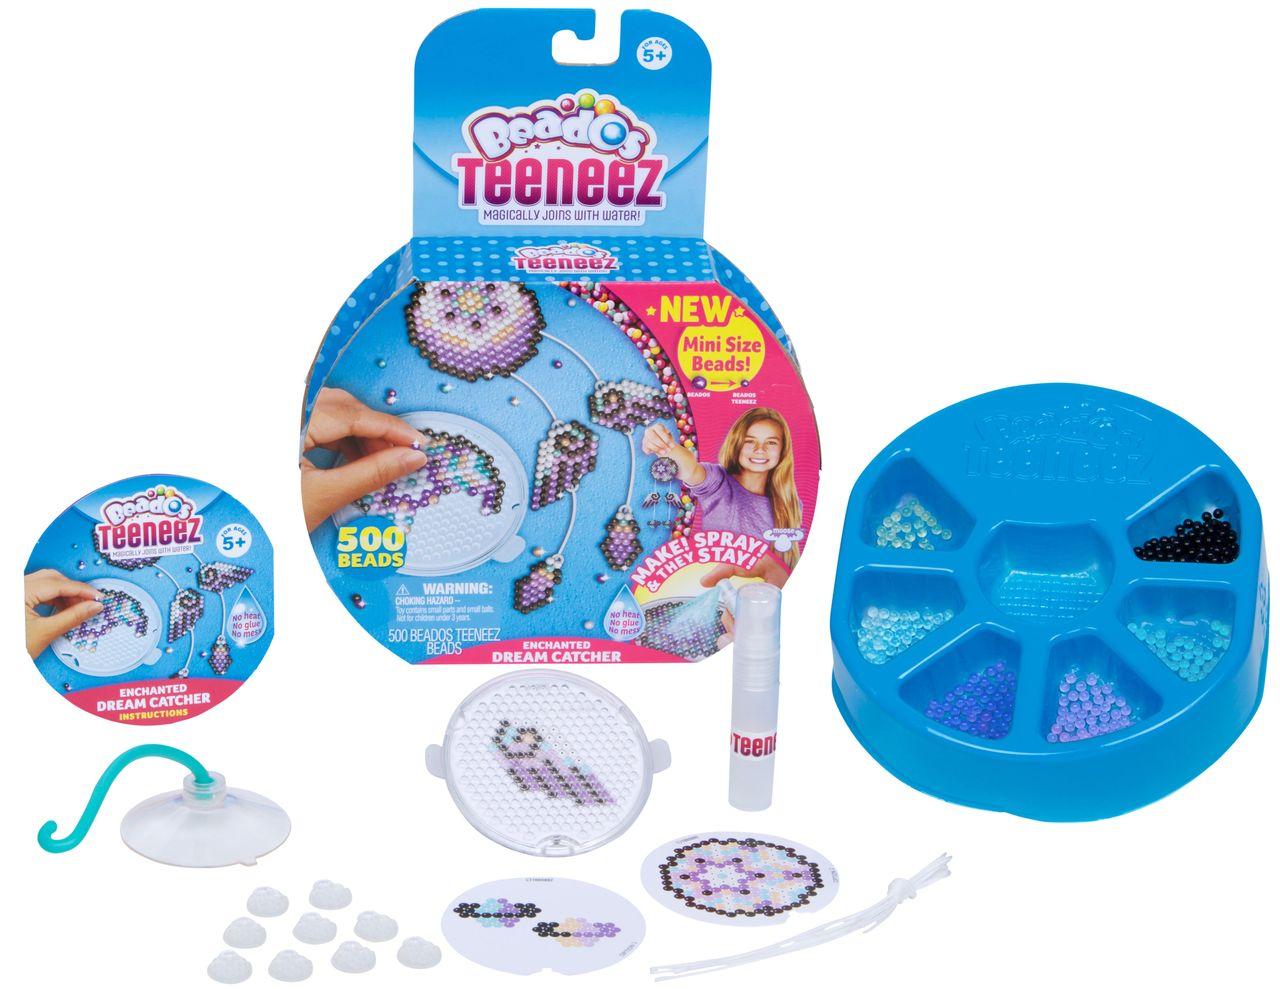 Beados Teeneez S2 Theme Pack Assorted